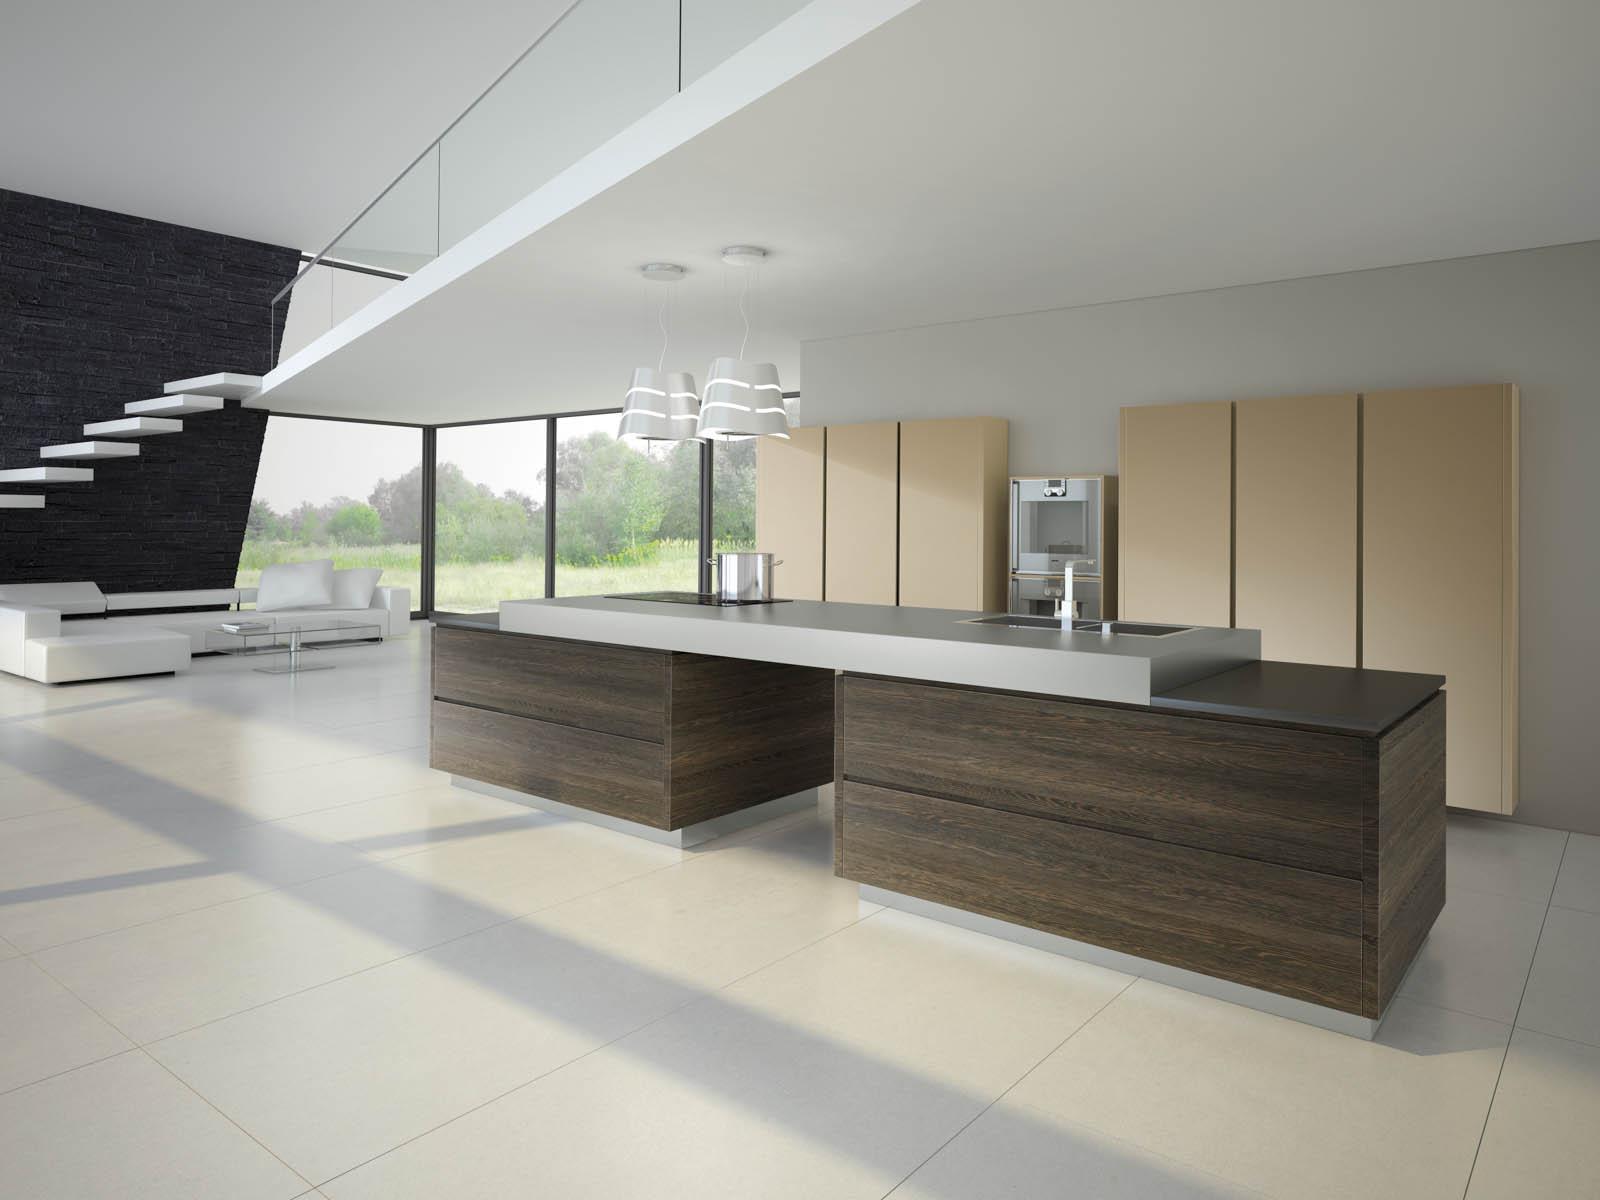 k chen aktuell buchholz verkaufsoffener sonntag home creation. Black Bedroom Furniture Sets. Home Design Ideas